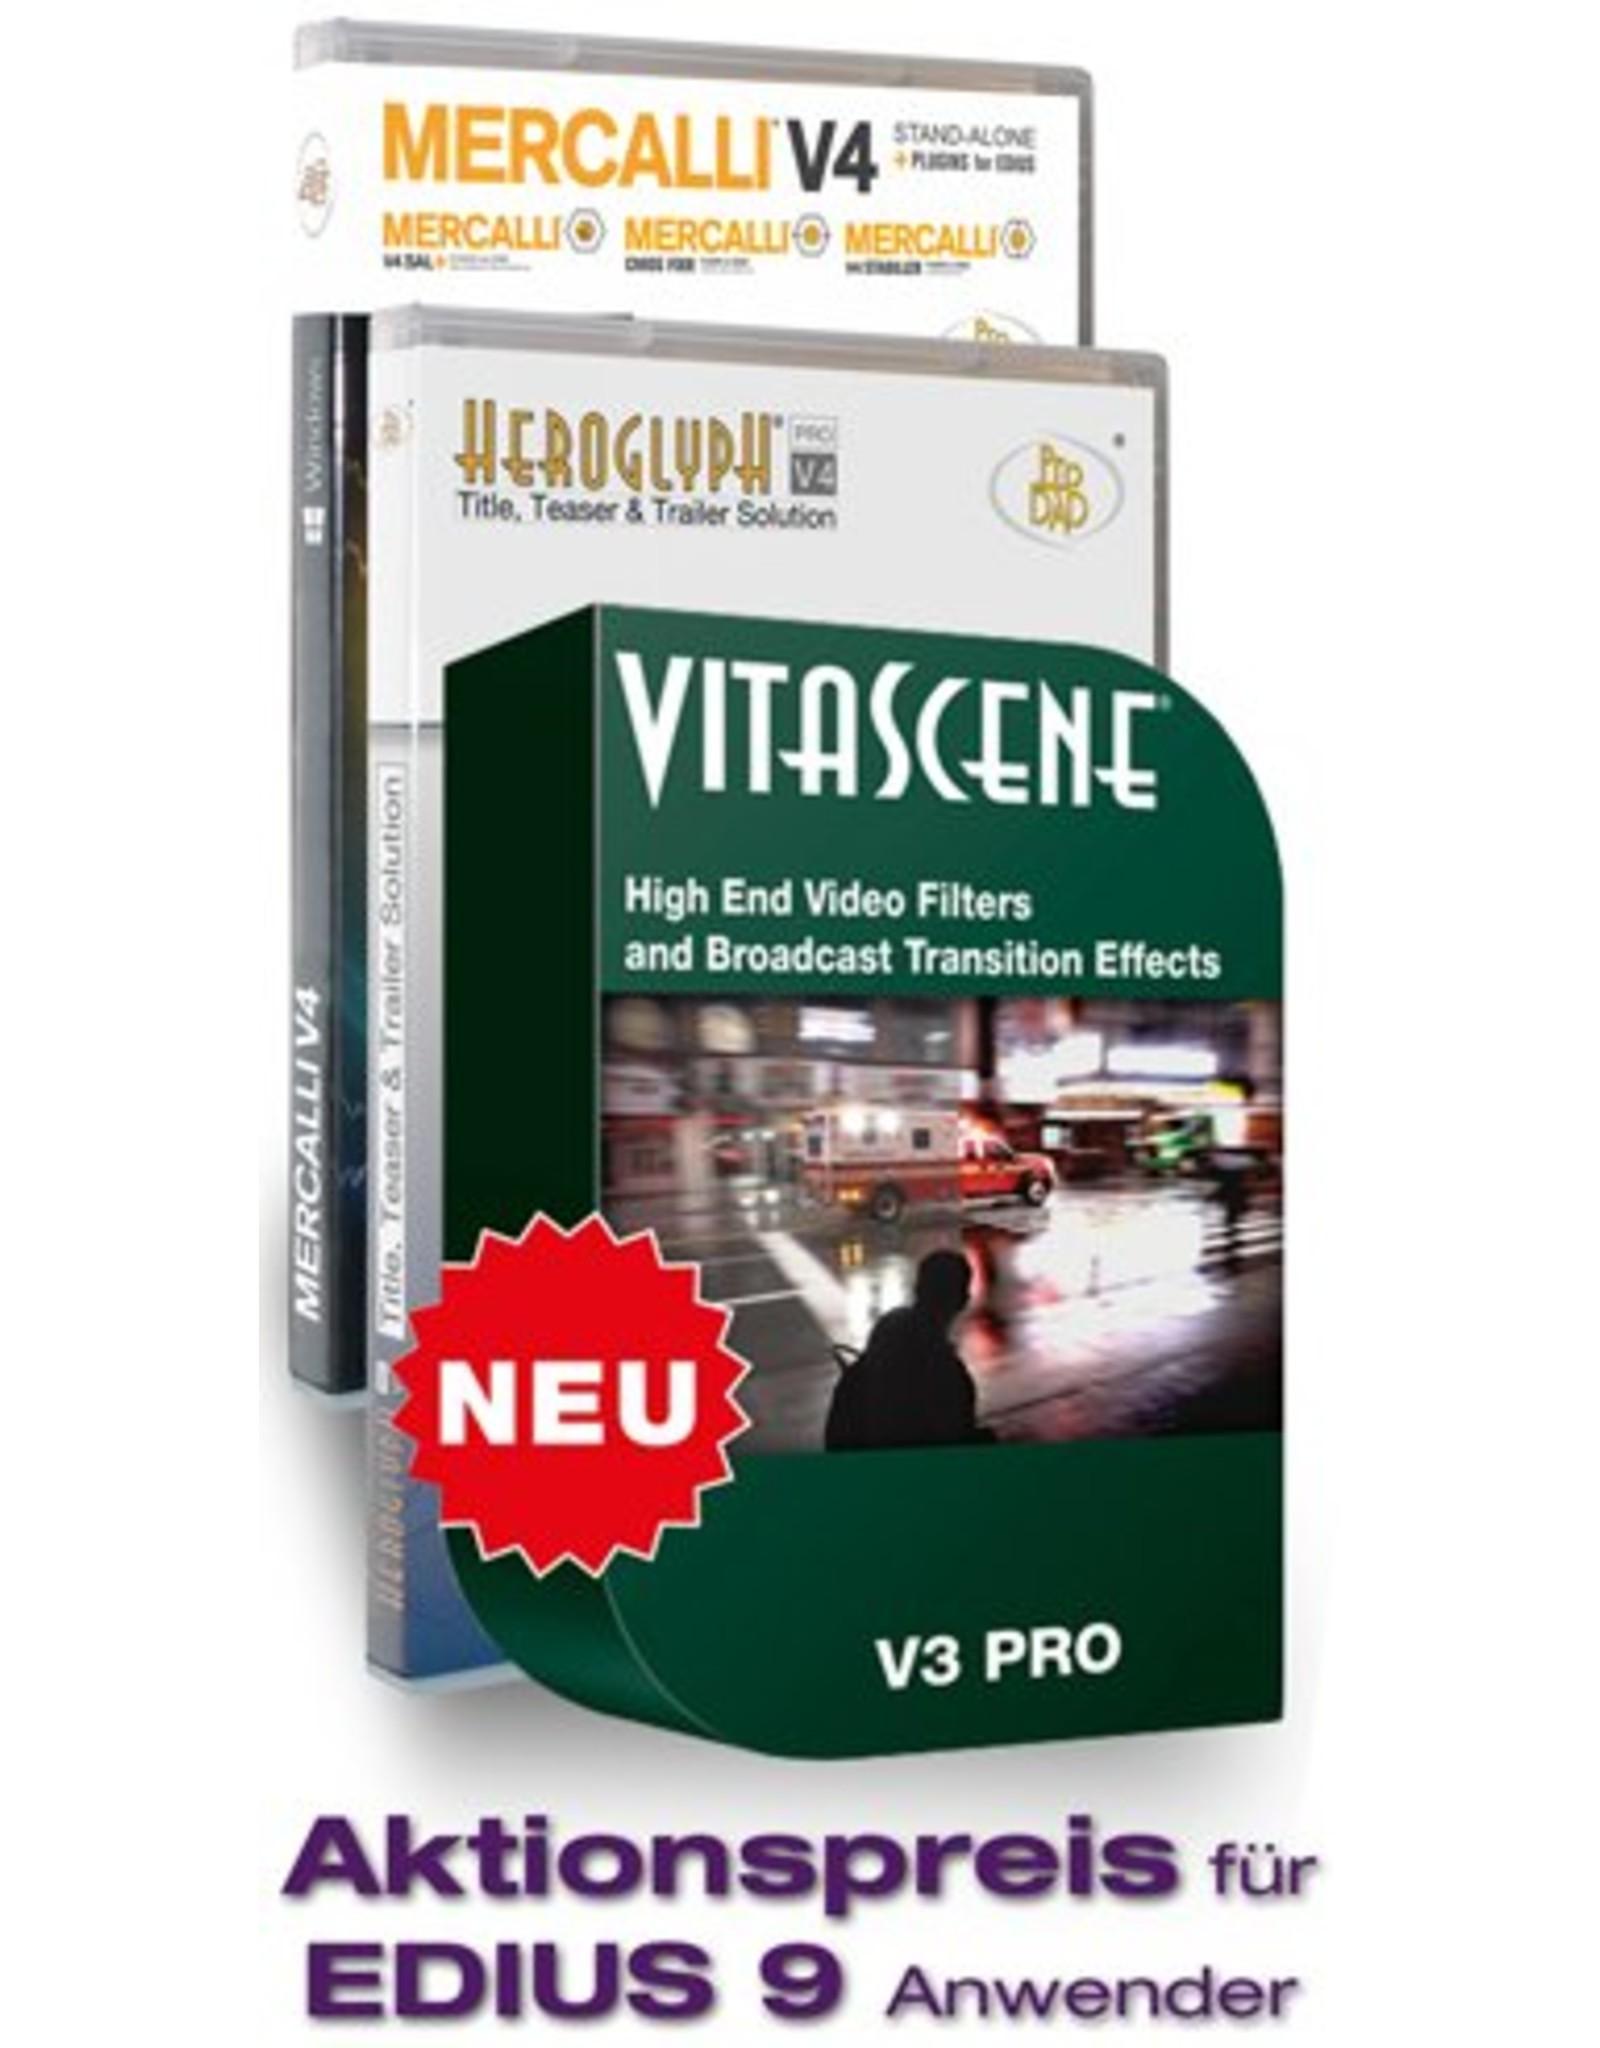 ProDAD ProDAD Vitascene V3 Pro + Mercalli V4 Suite + Heroglyph V4 Pro Promo Plug-ins for EDIUS 9